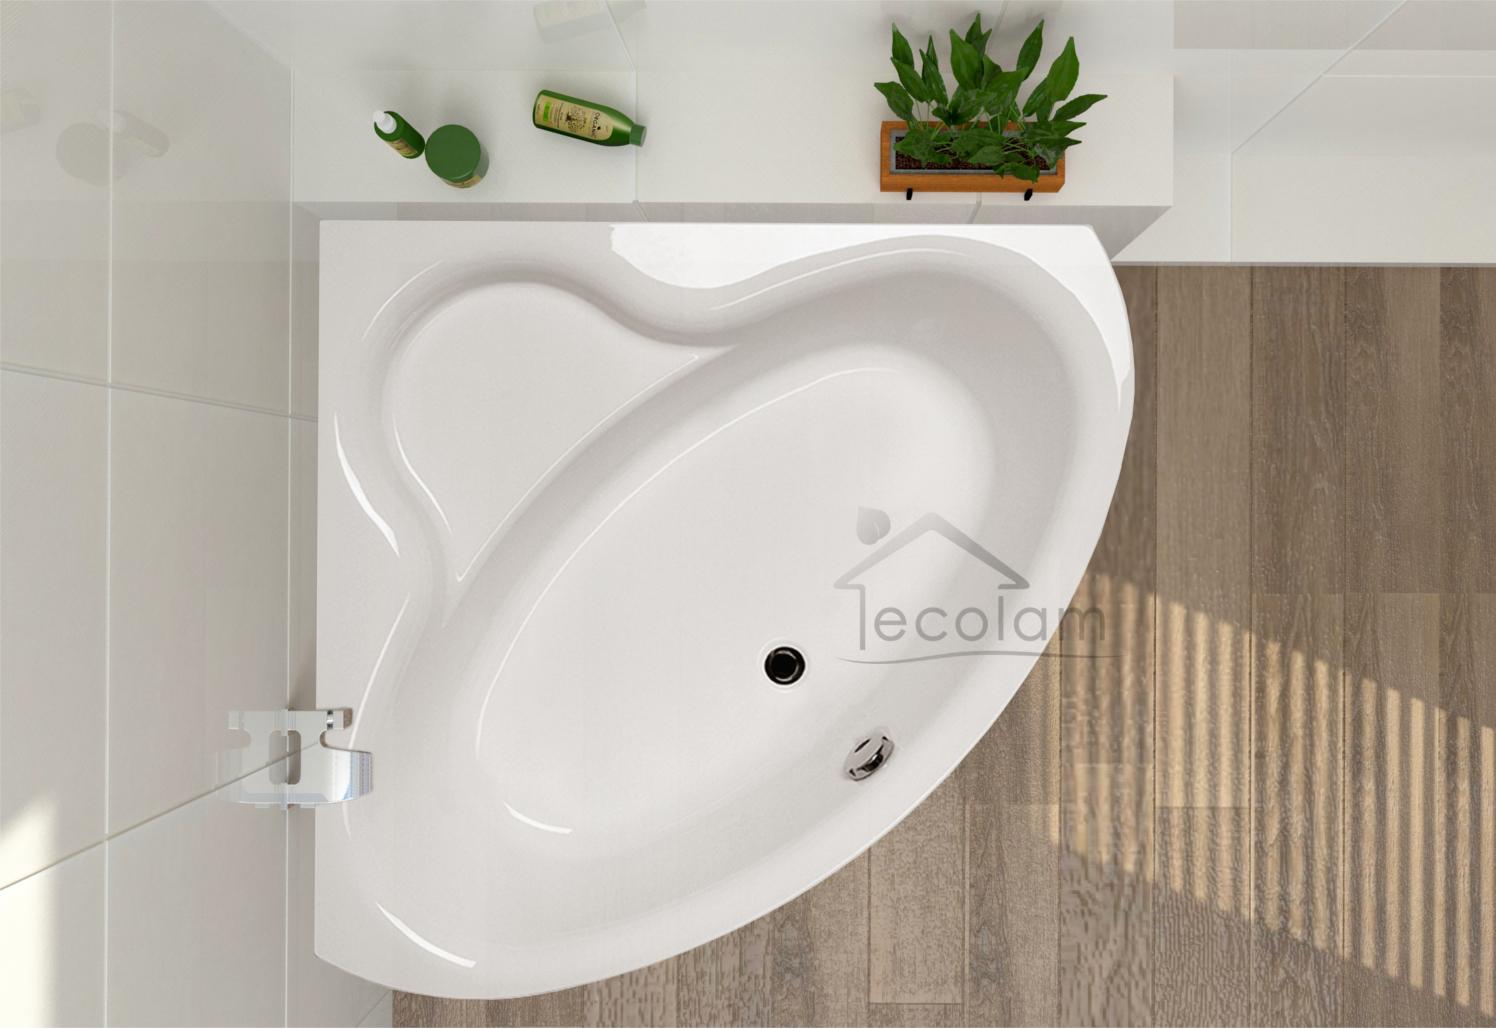 badewanne wanne eckbadewanne symmetrisch acryl 130 x 130. Black Bedroom Furniture Sets. Home Design Ideas